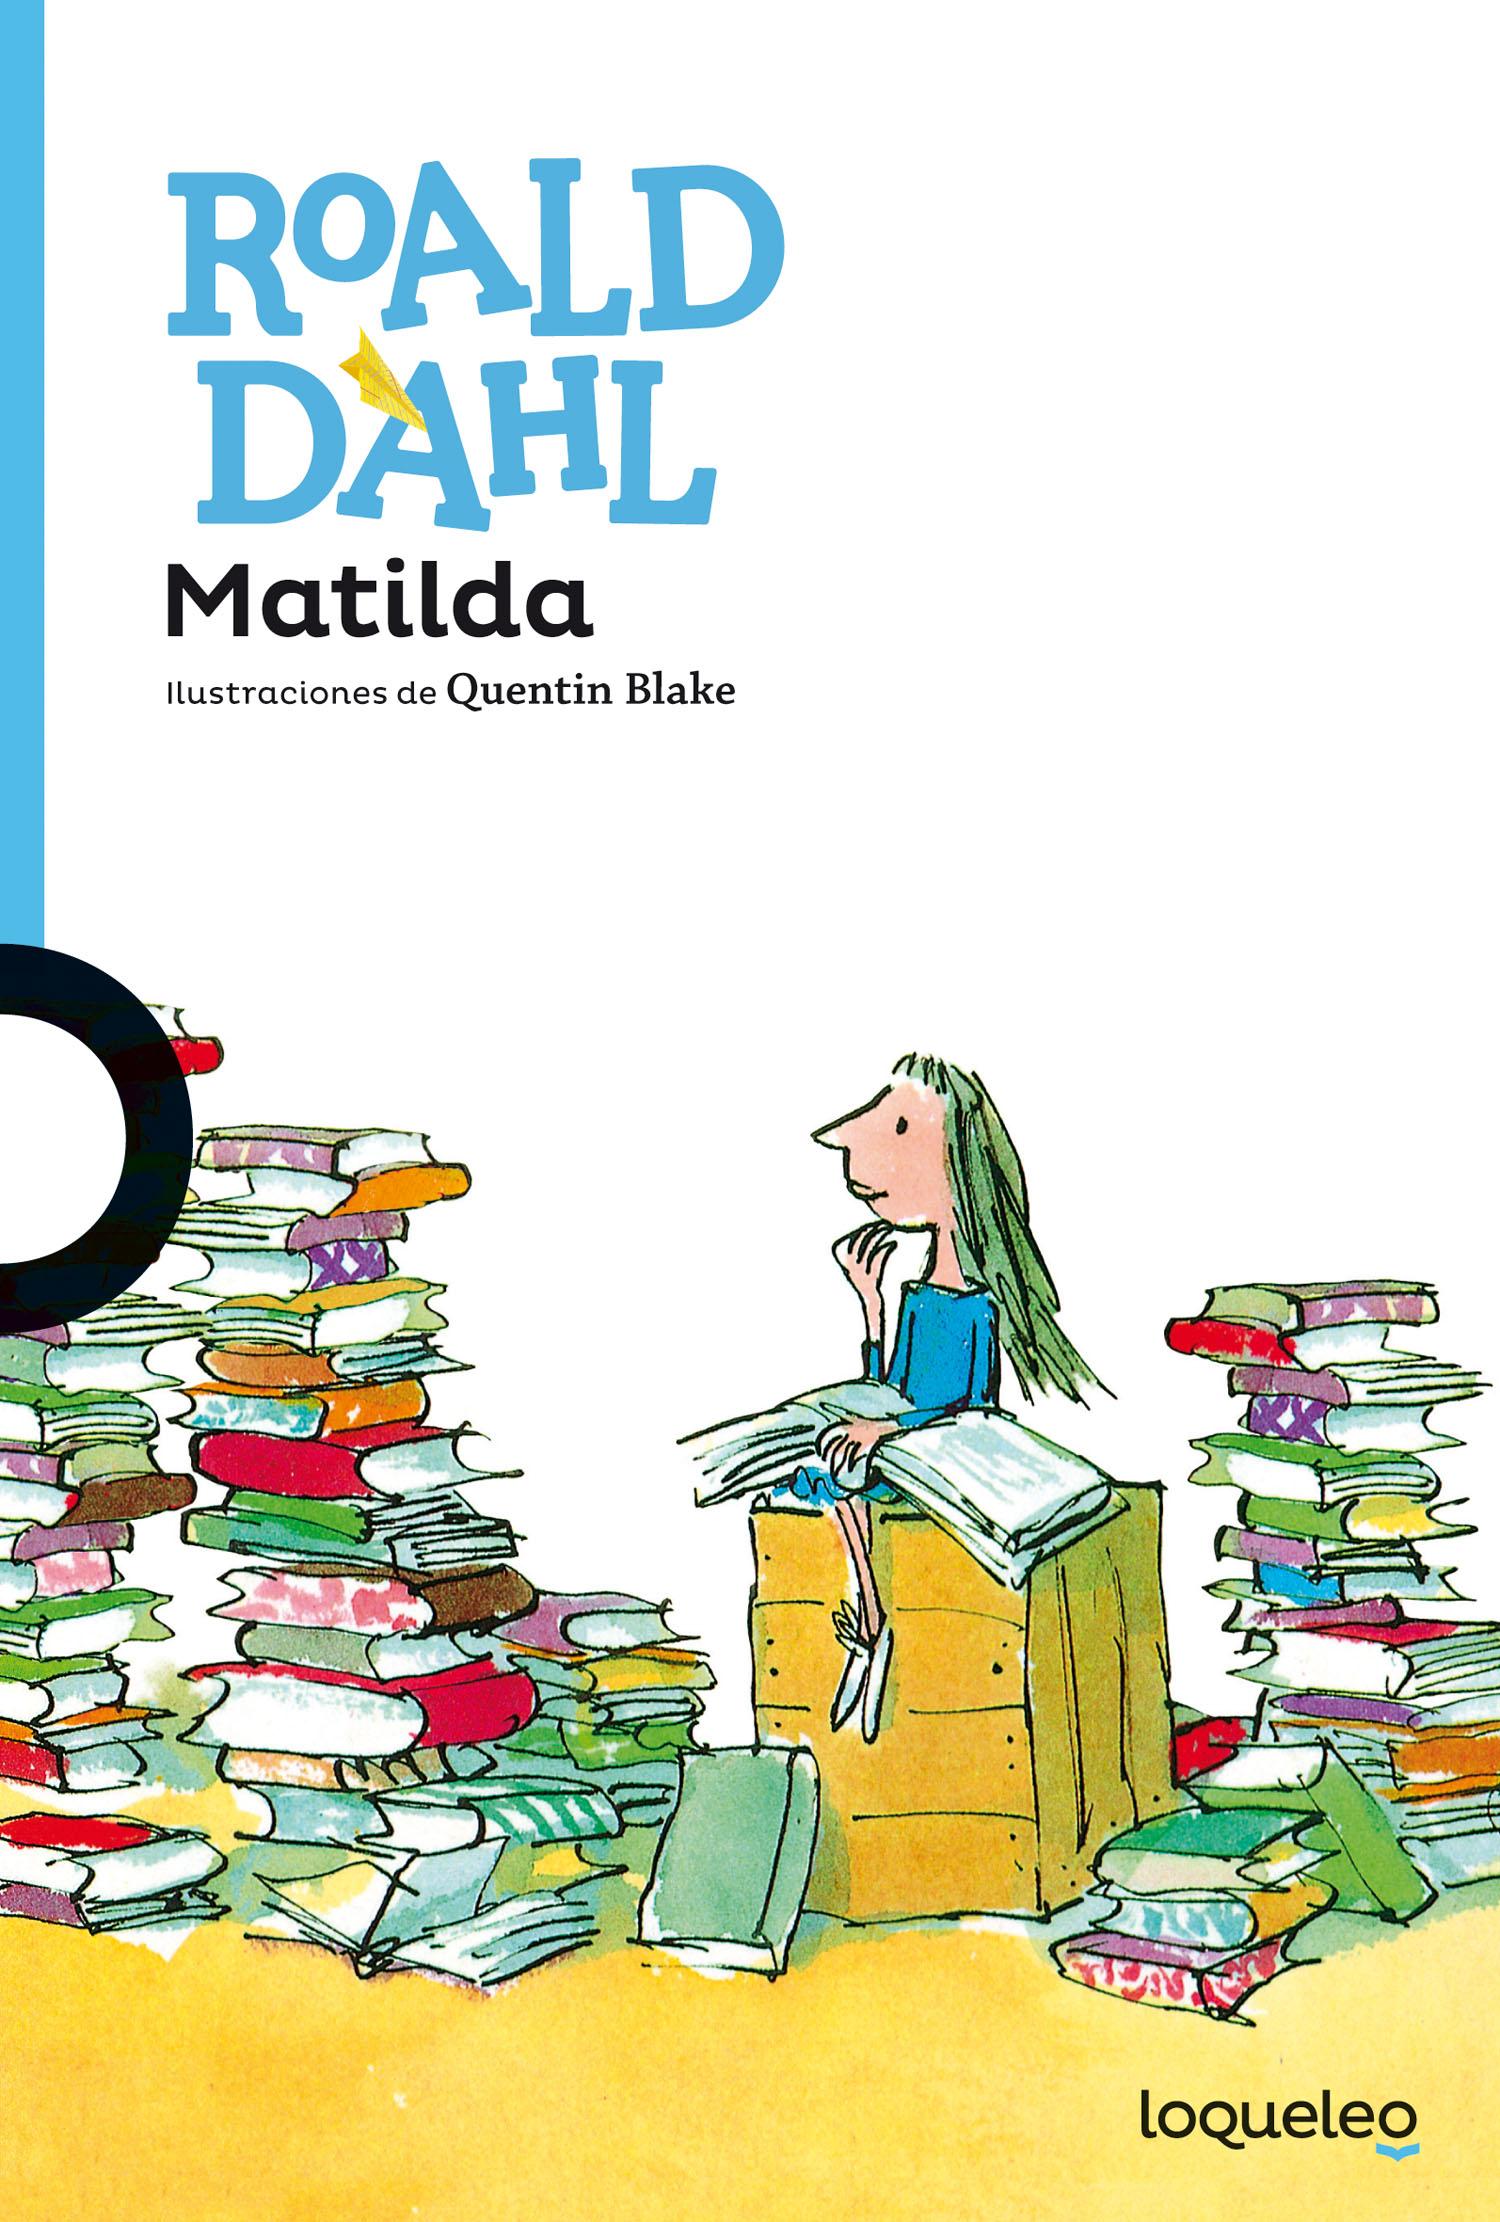 roald dahl_matilda.indd